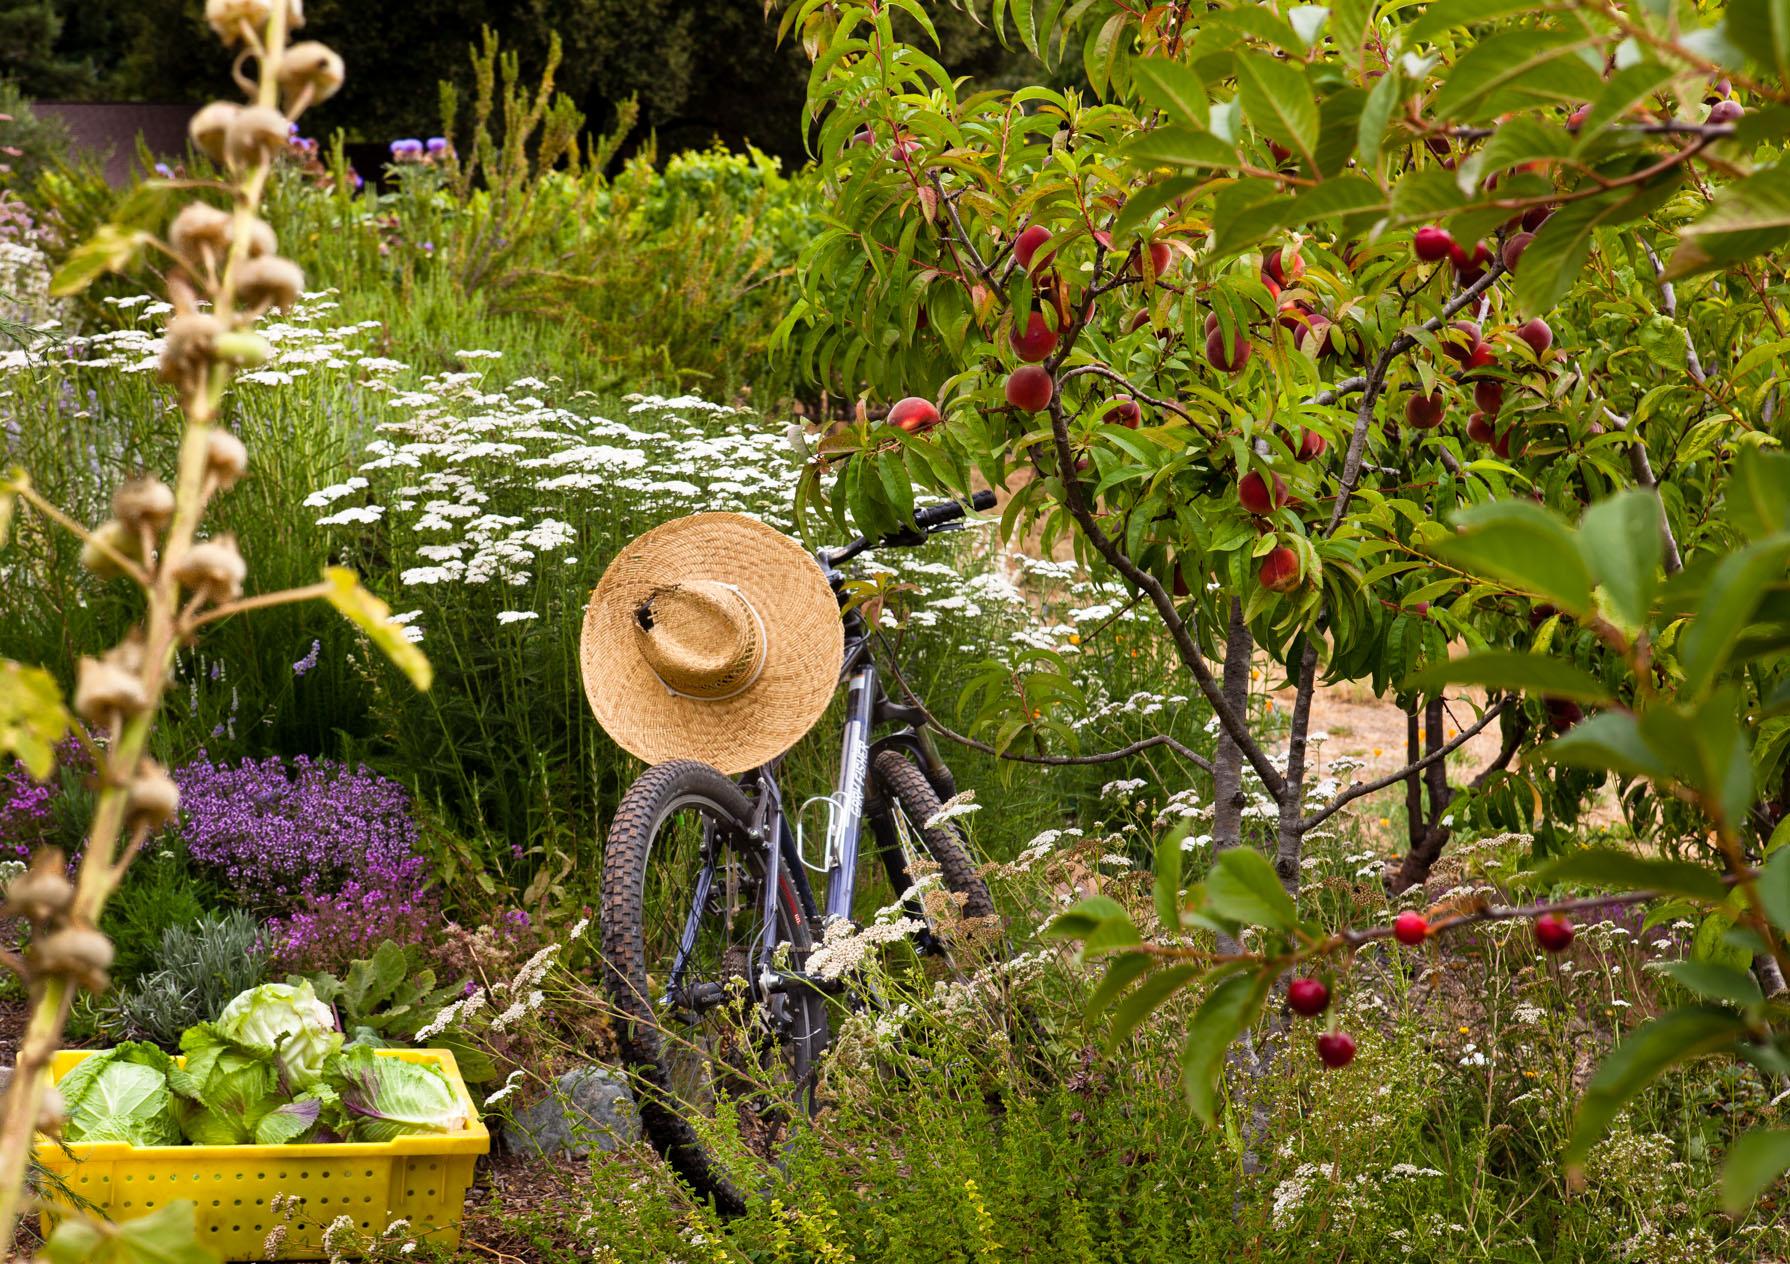 Gardener's bike in vegetable garden